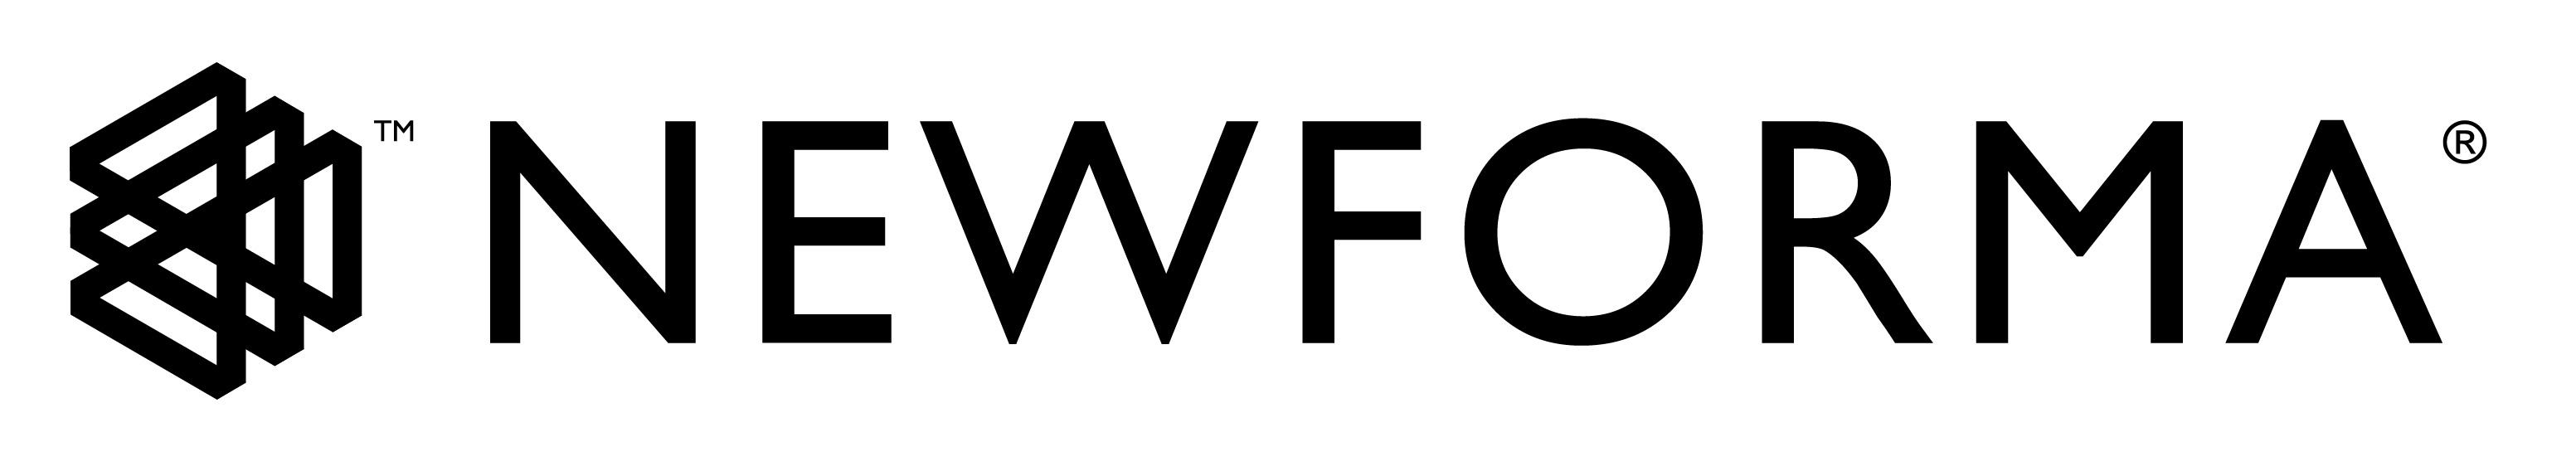 Newforma_Logo_tm_blk-01